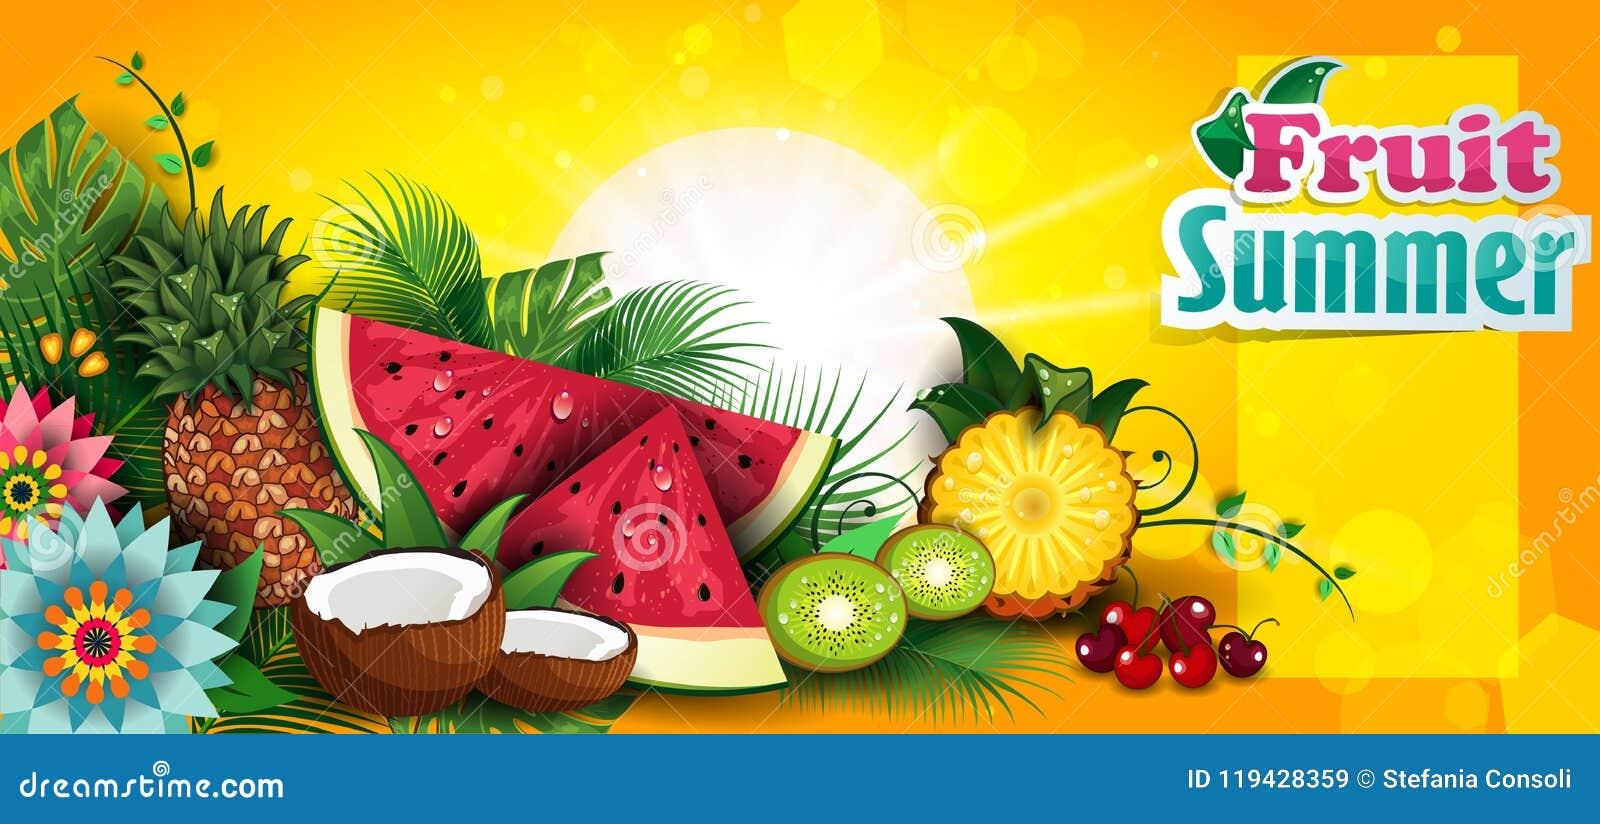 tropical summer fruit banner stock illustration illustration of